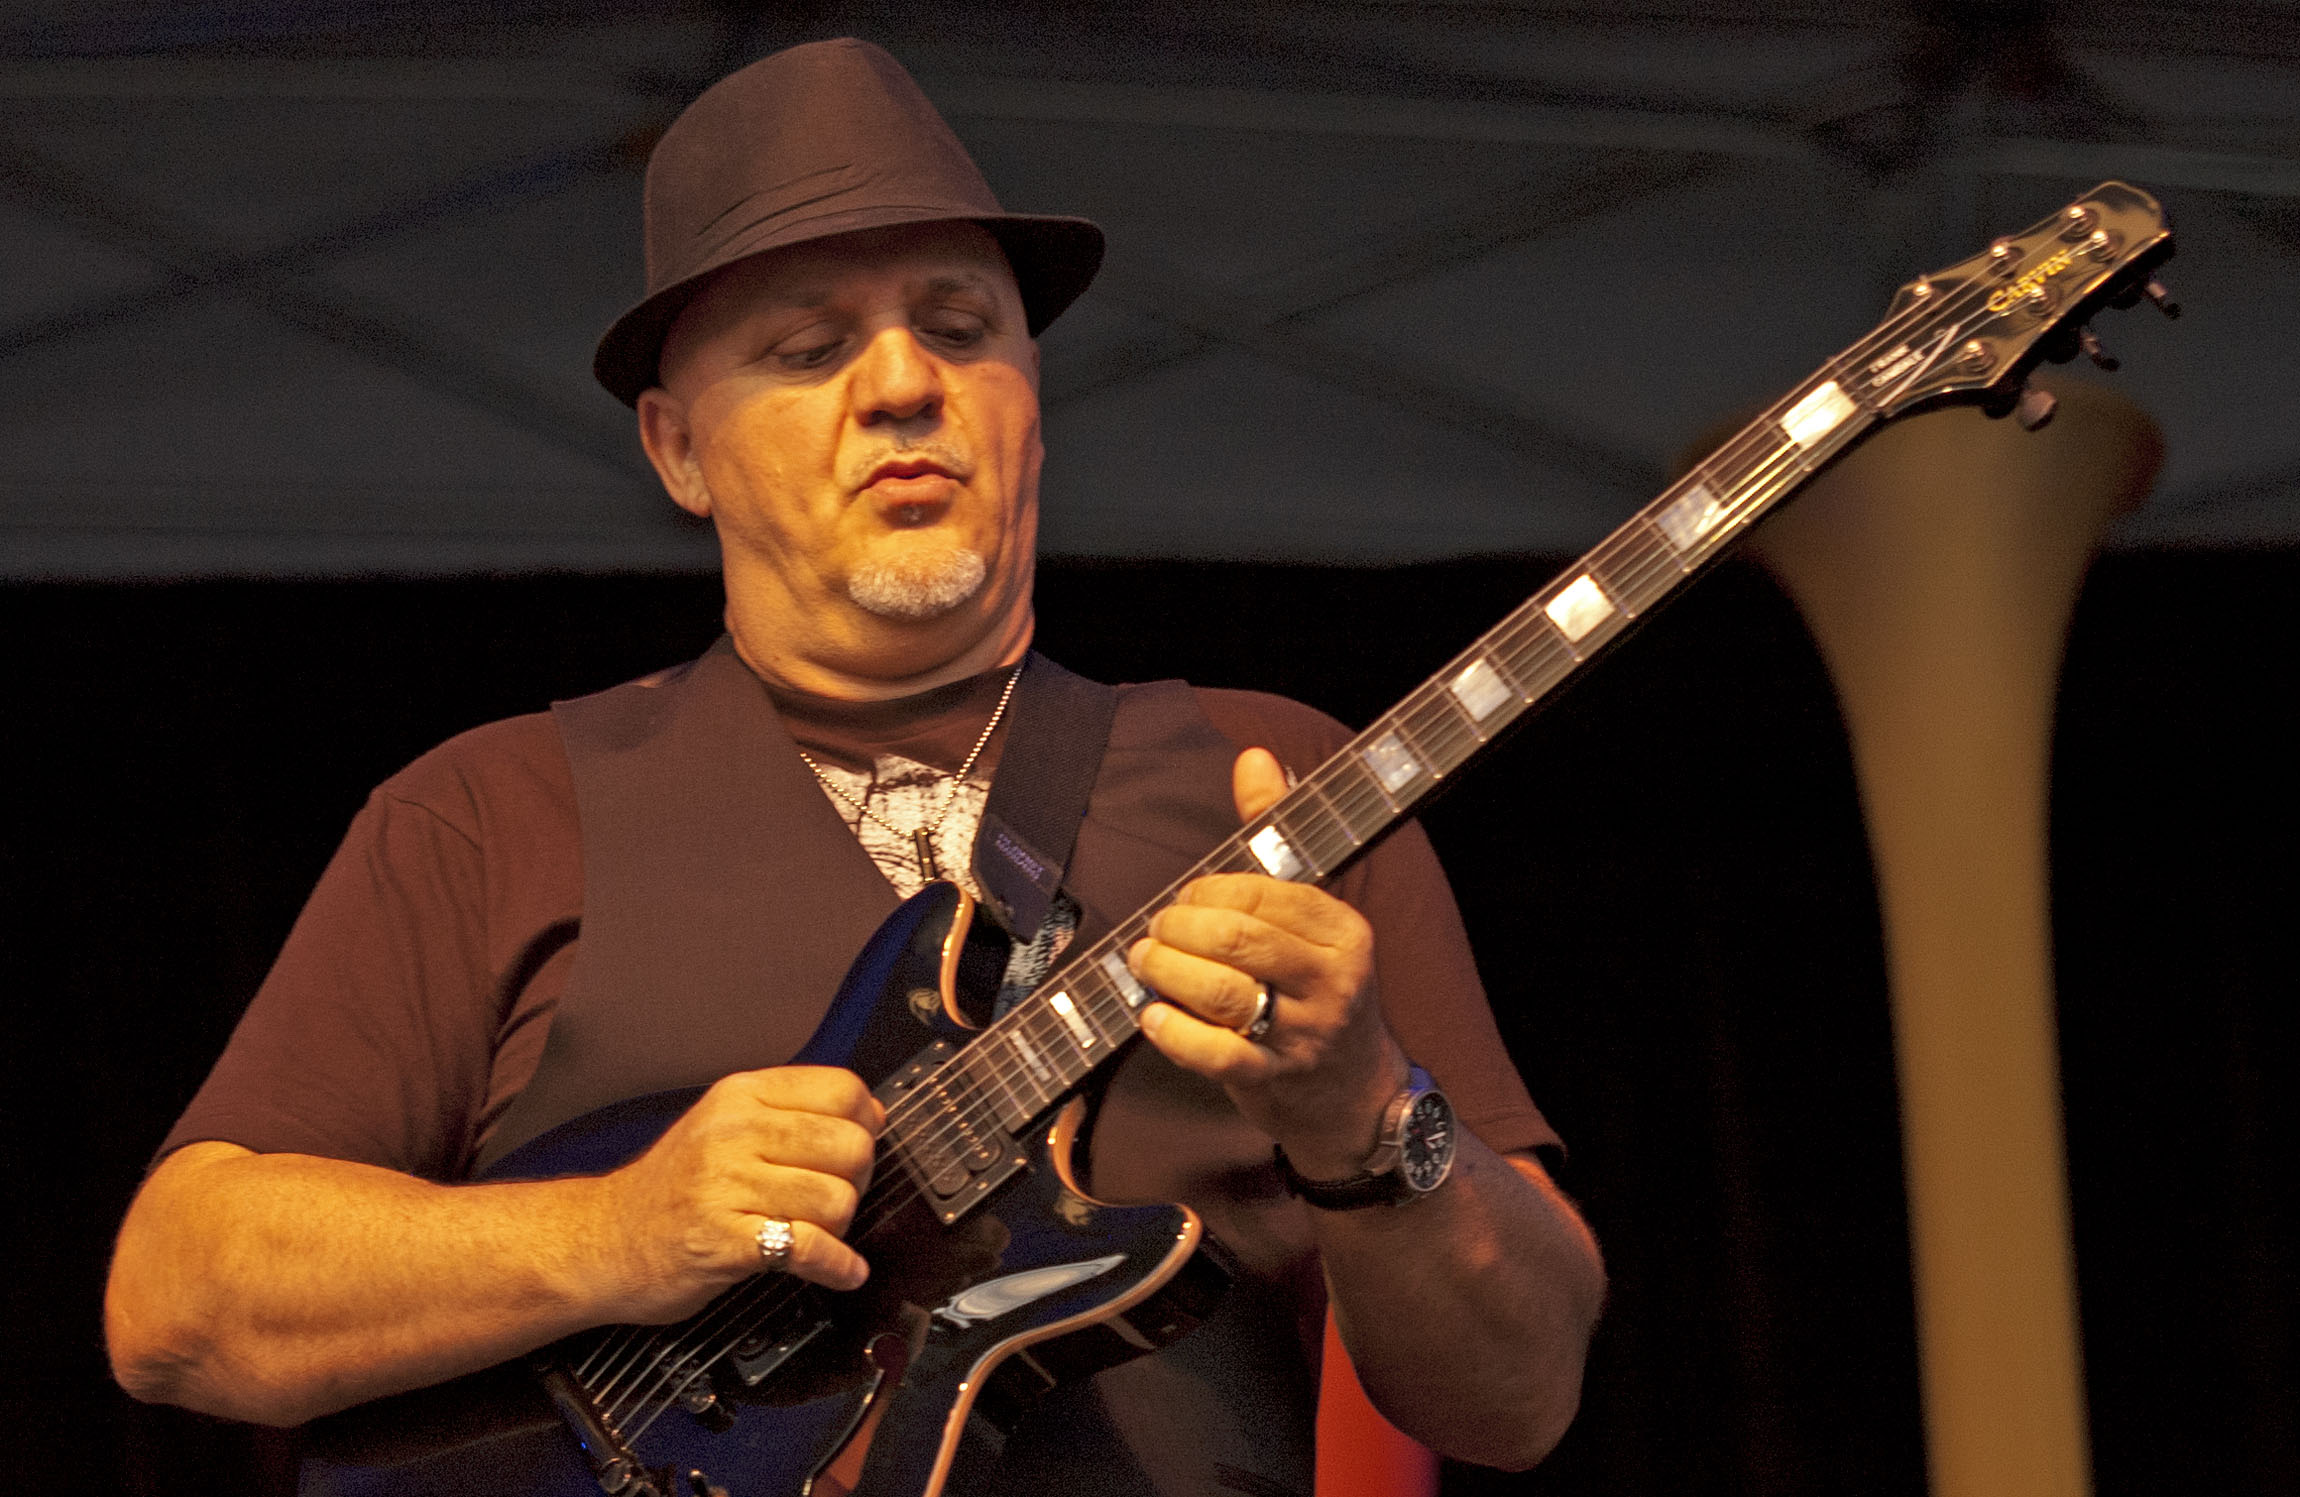 Frank Gambale, 2011 Ottawa Jazz Festival